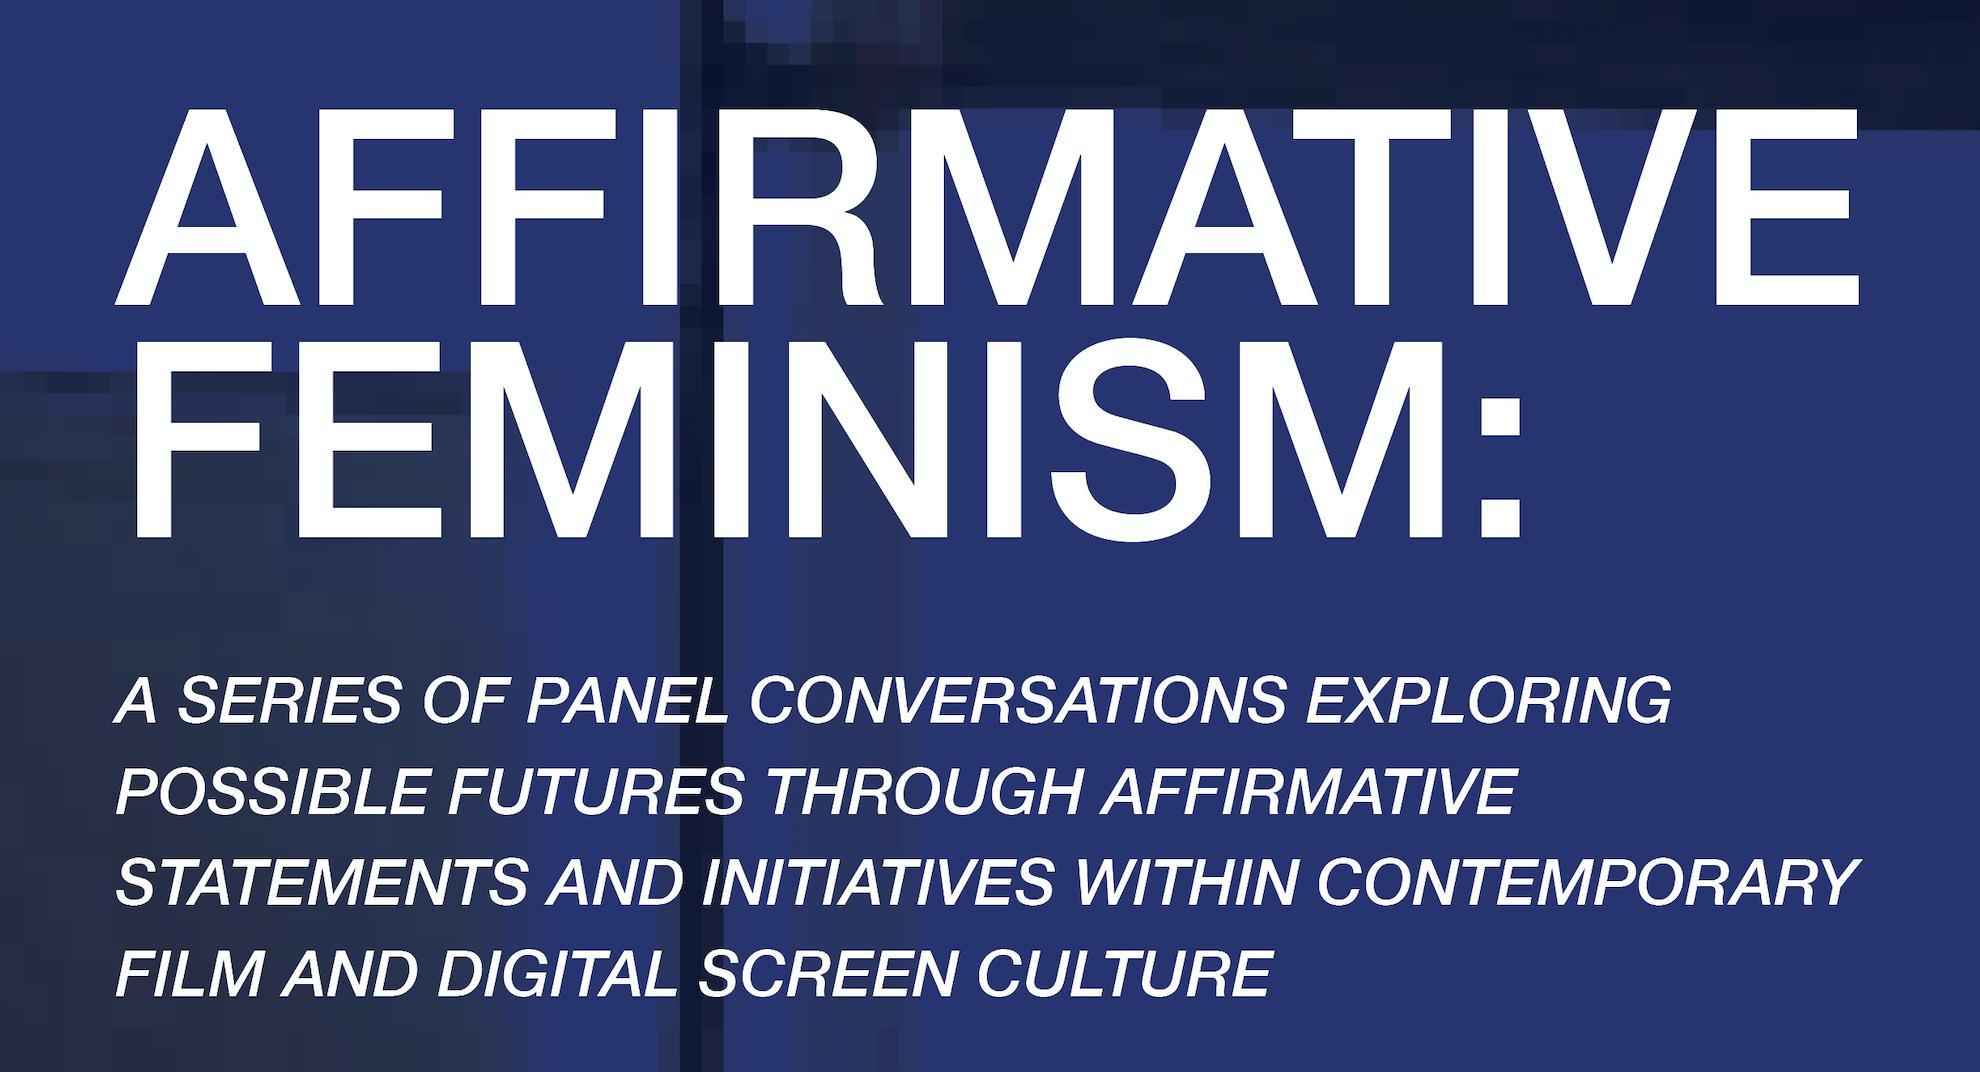 Affirmative Feminism